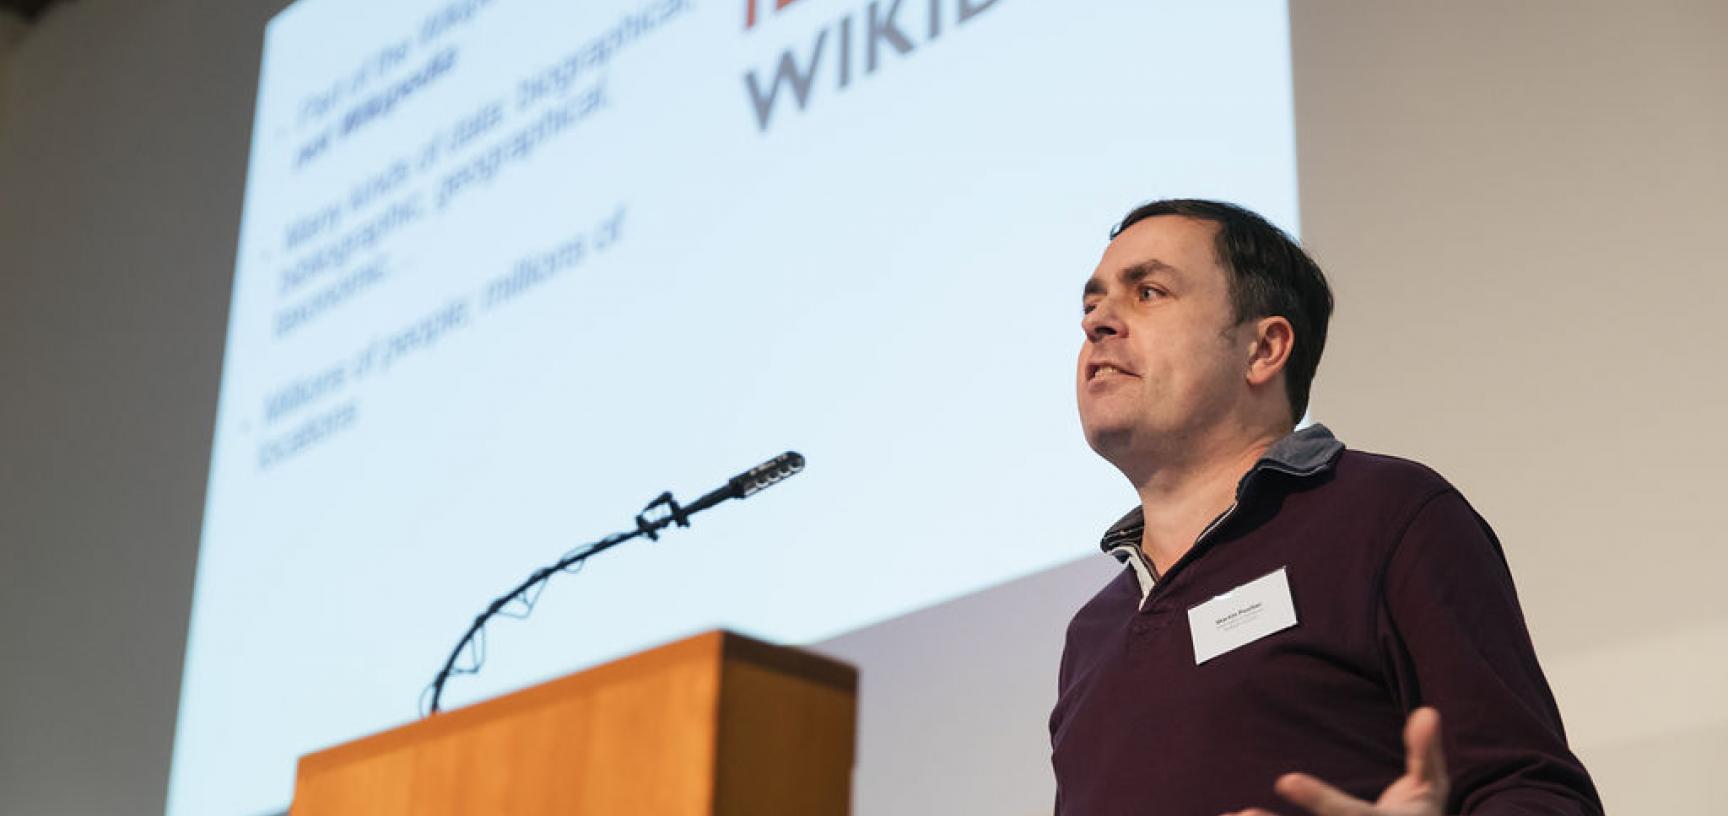 GLAM digital showcase, Wikidata talk